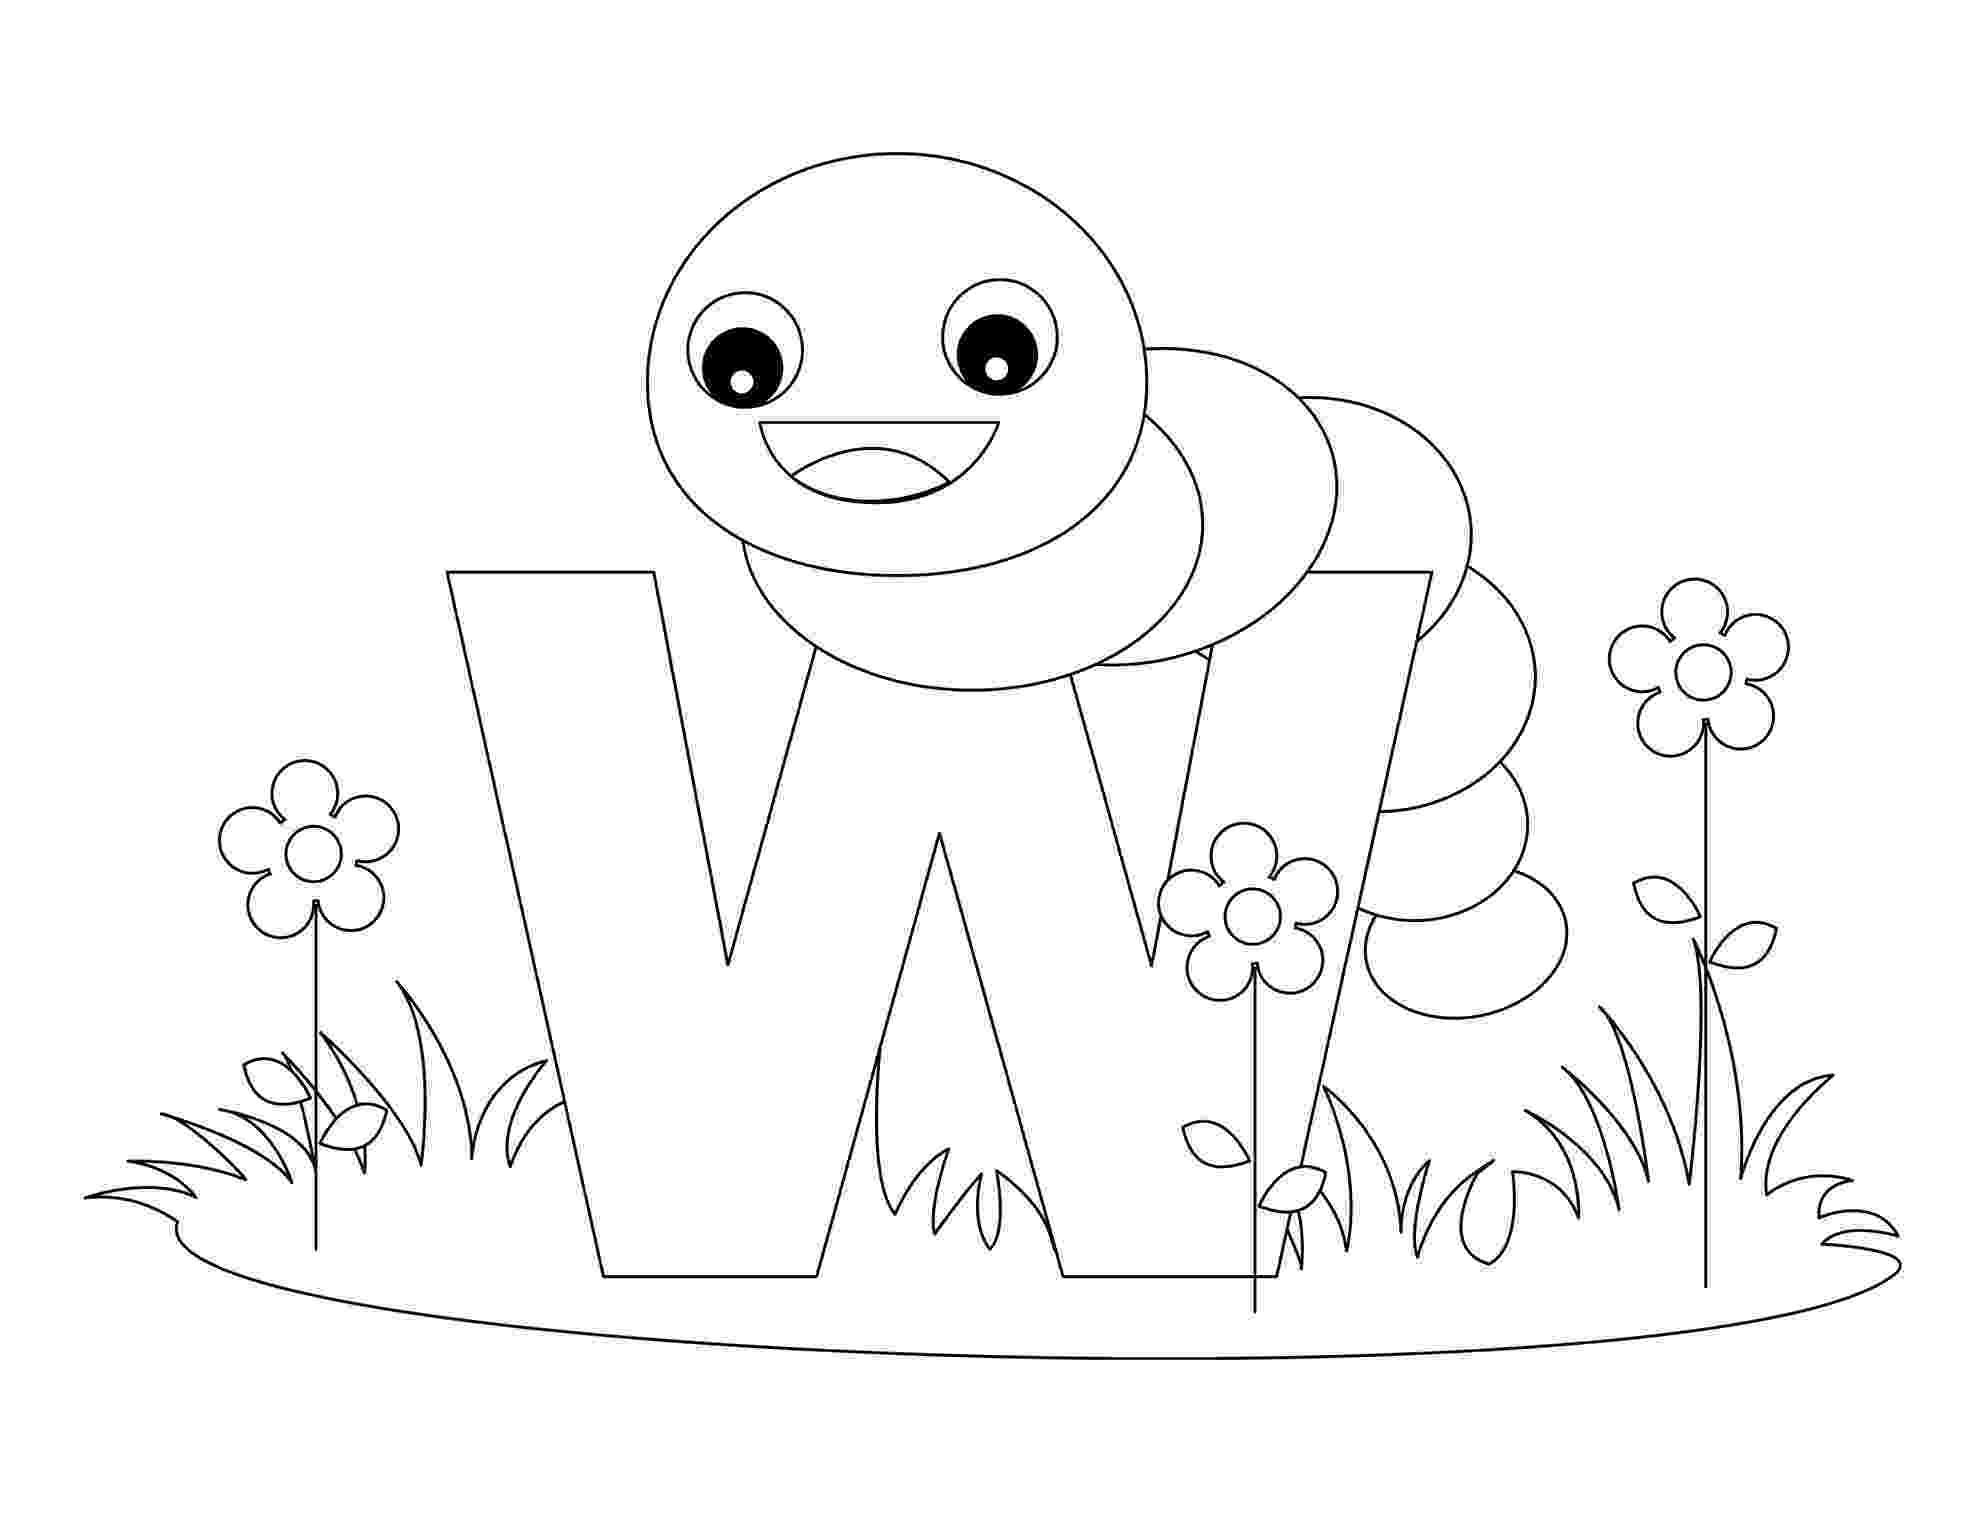 alphabet coloring free printable alphabet coloring pages for kids best alphabet coloring 1 10